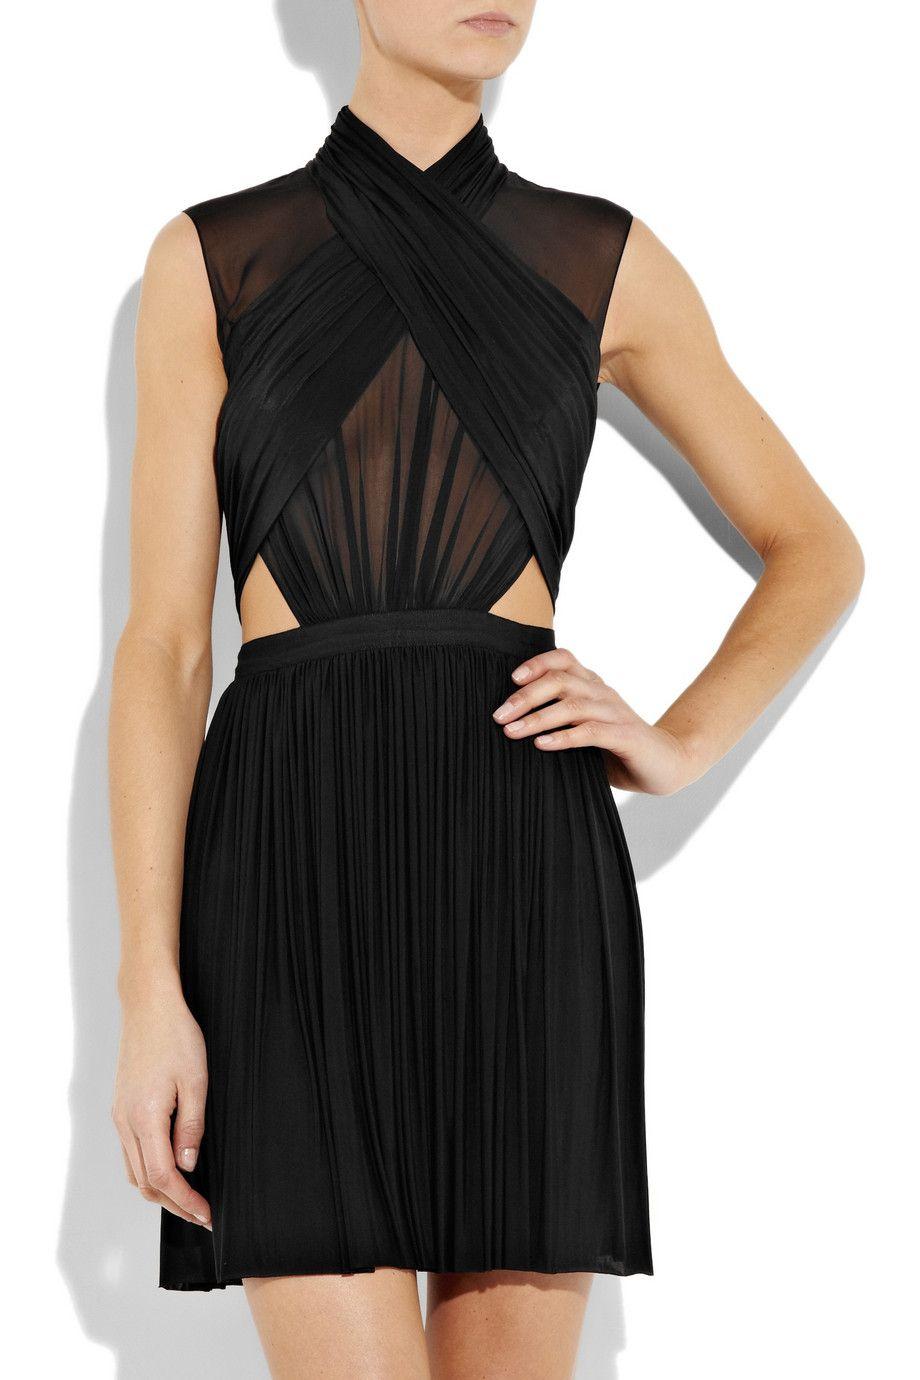 Black Stretch Jersey And Silk Chiffon Dress Alexander Wang Fashion Little Black Dress Alexander Wang Dress